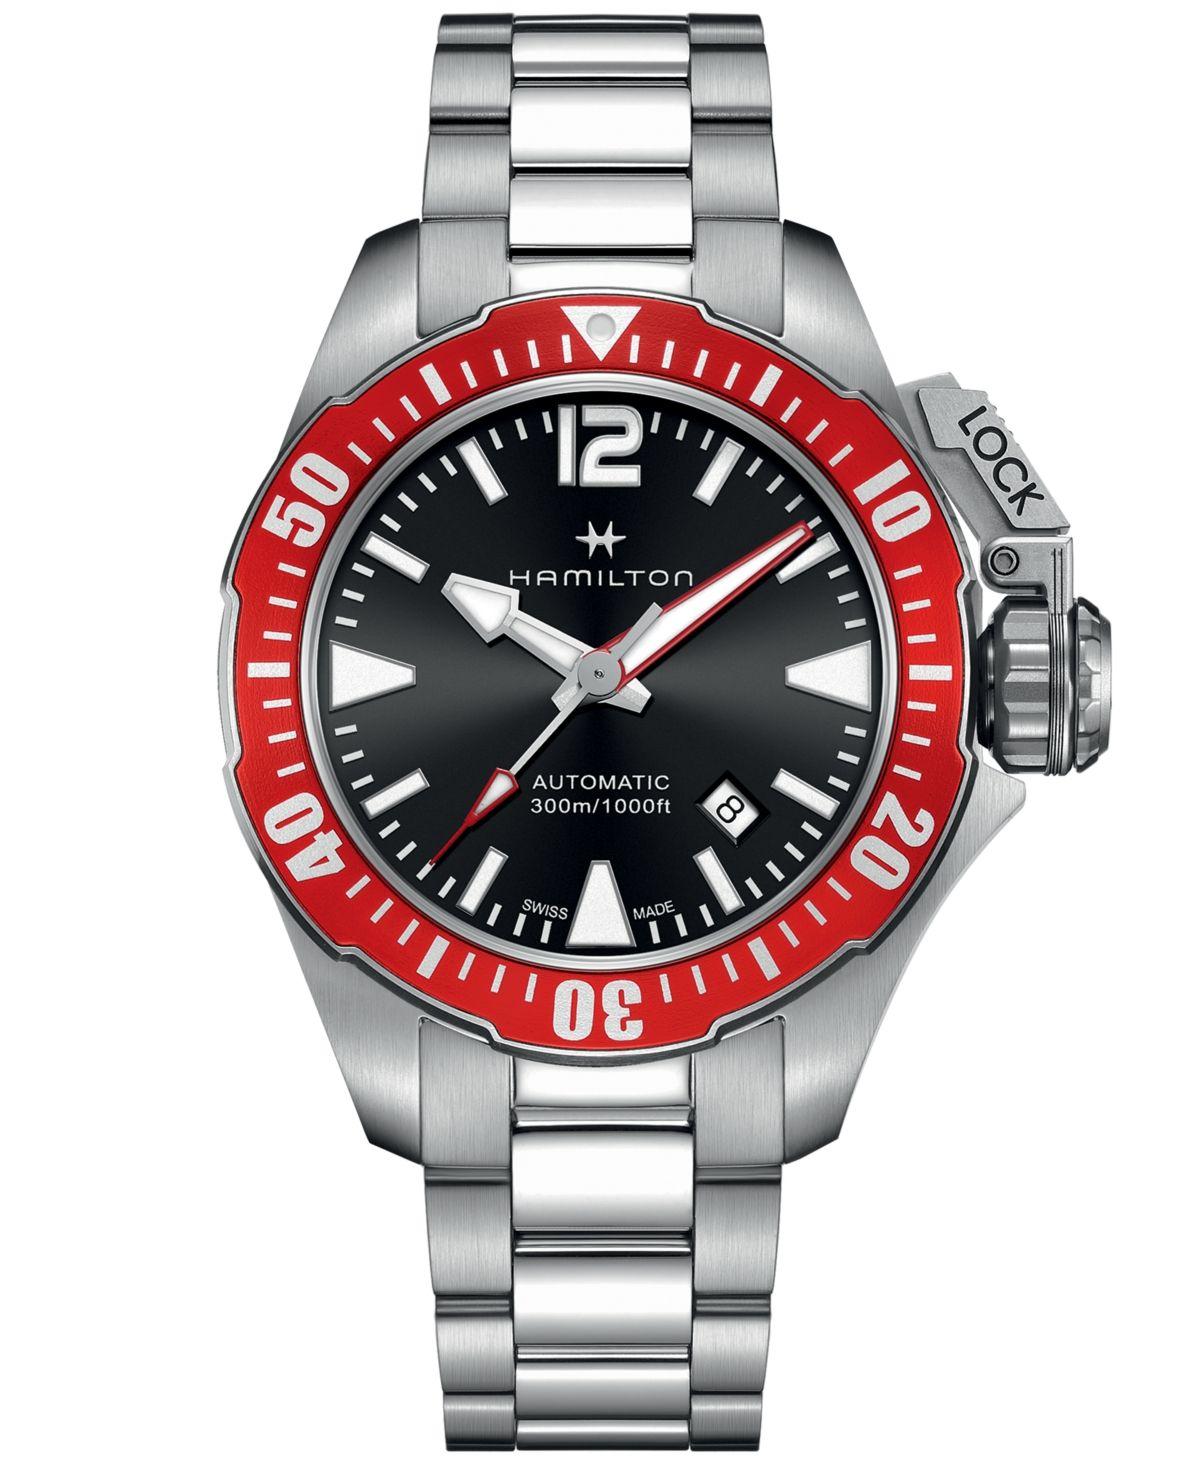 Hamilton Men's Swiss Automatic Khaki Frogman Stainless Steel Bracelet Watch 42mm #stainlesssteelrolex